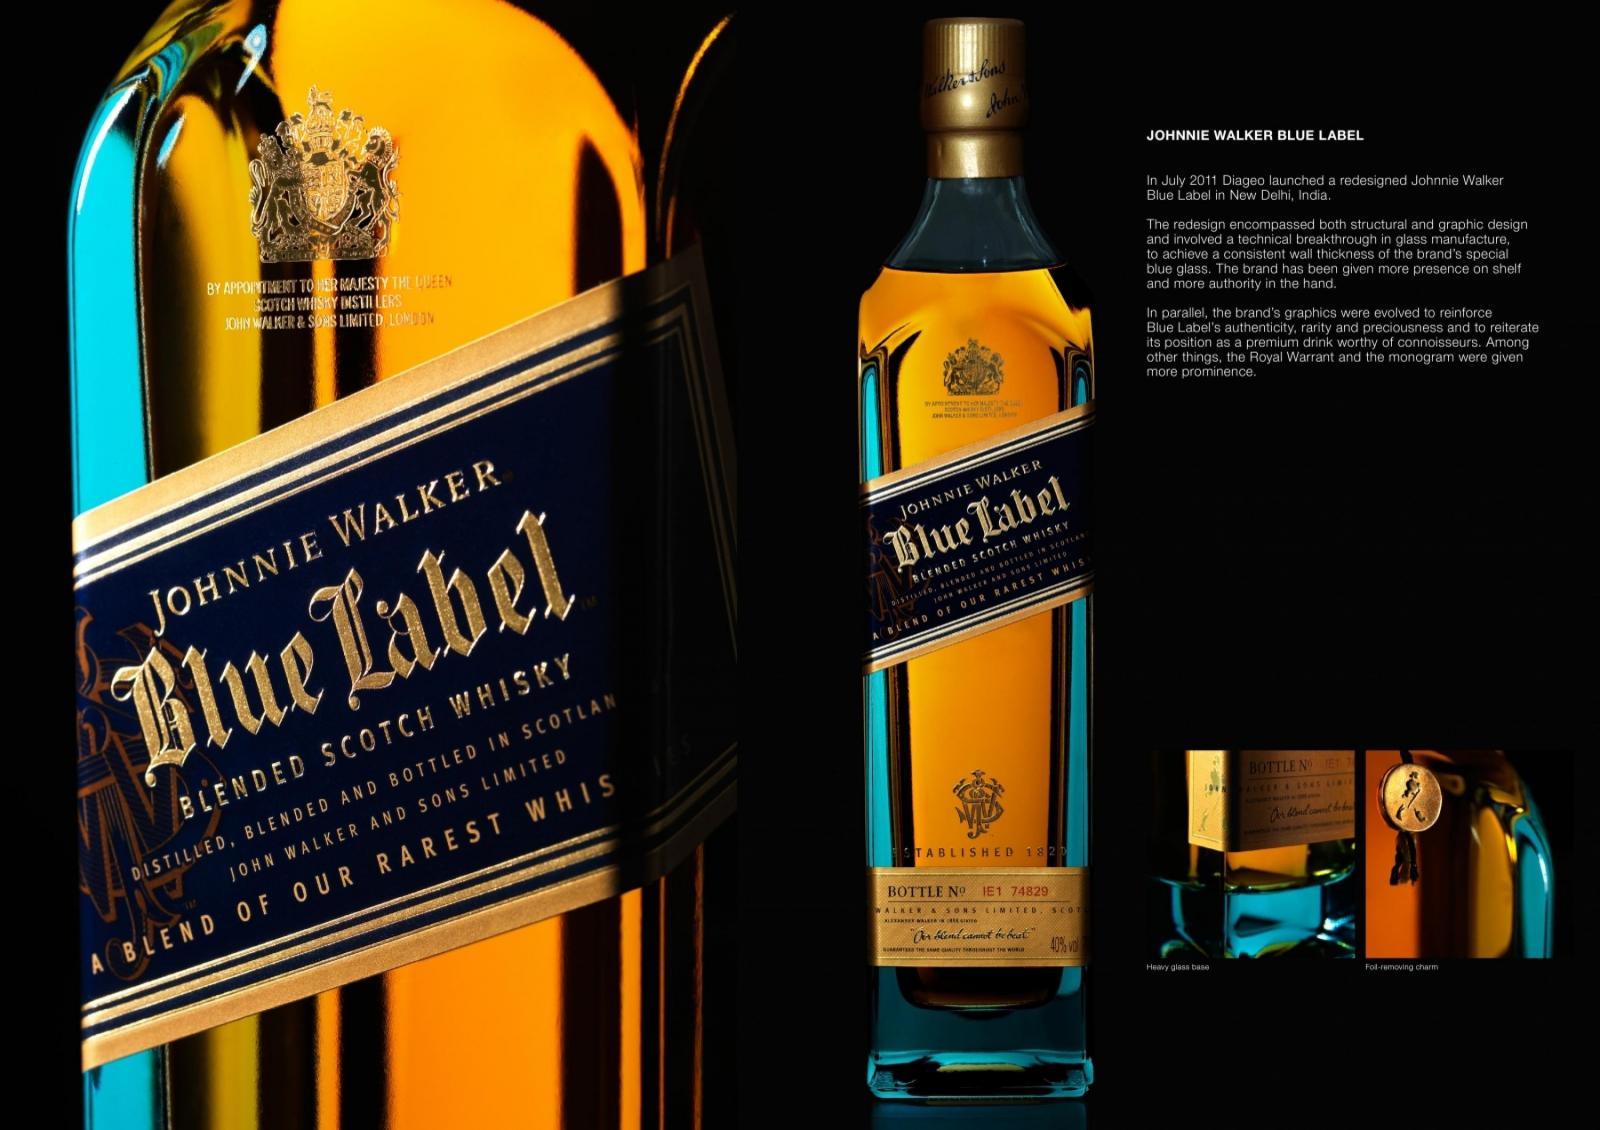 diary of whisky johnnie walker blue label. Black Bedroom Furniture Sets. Home Design Ideas